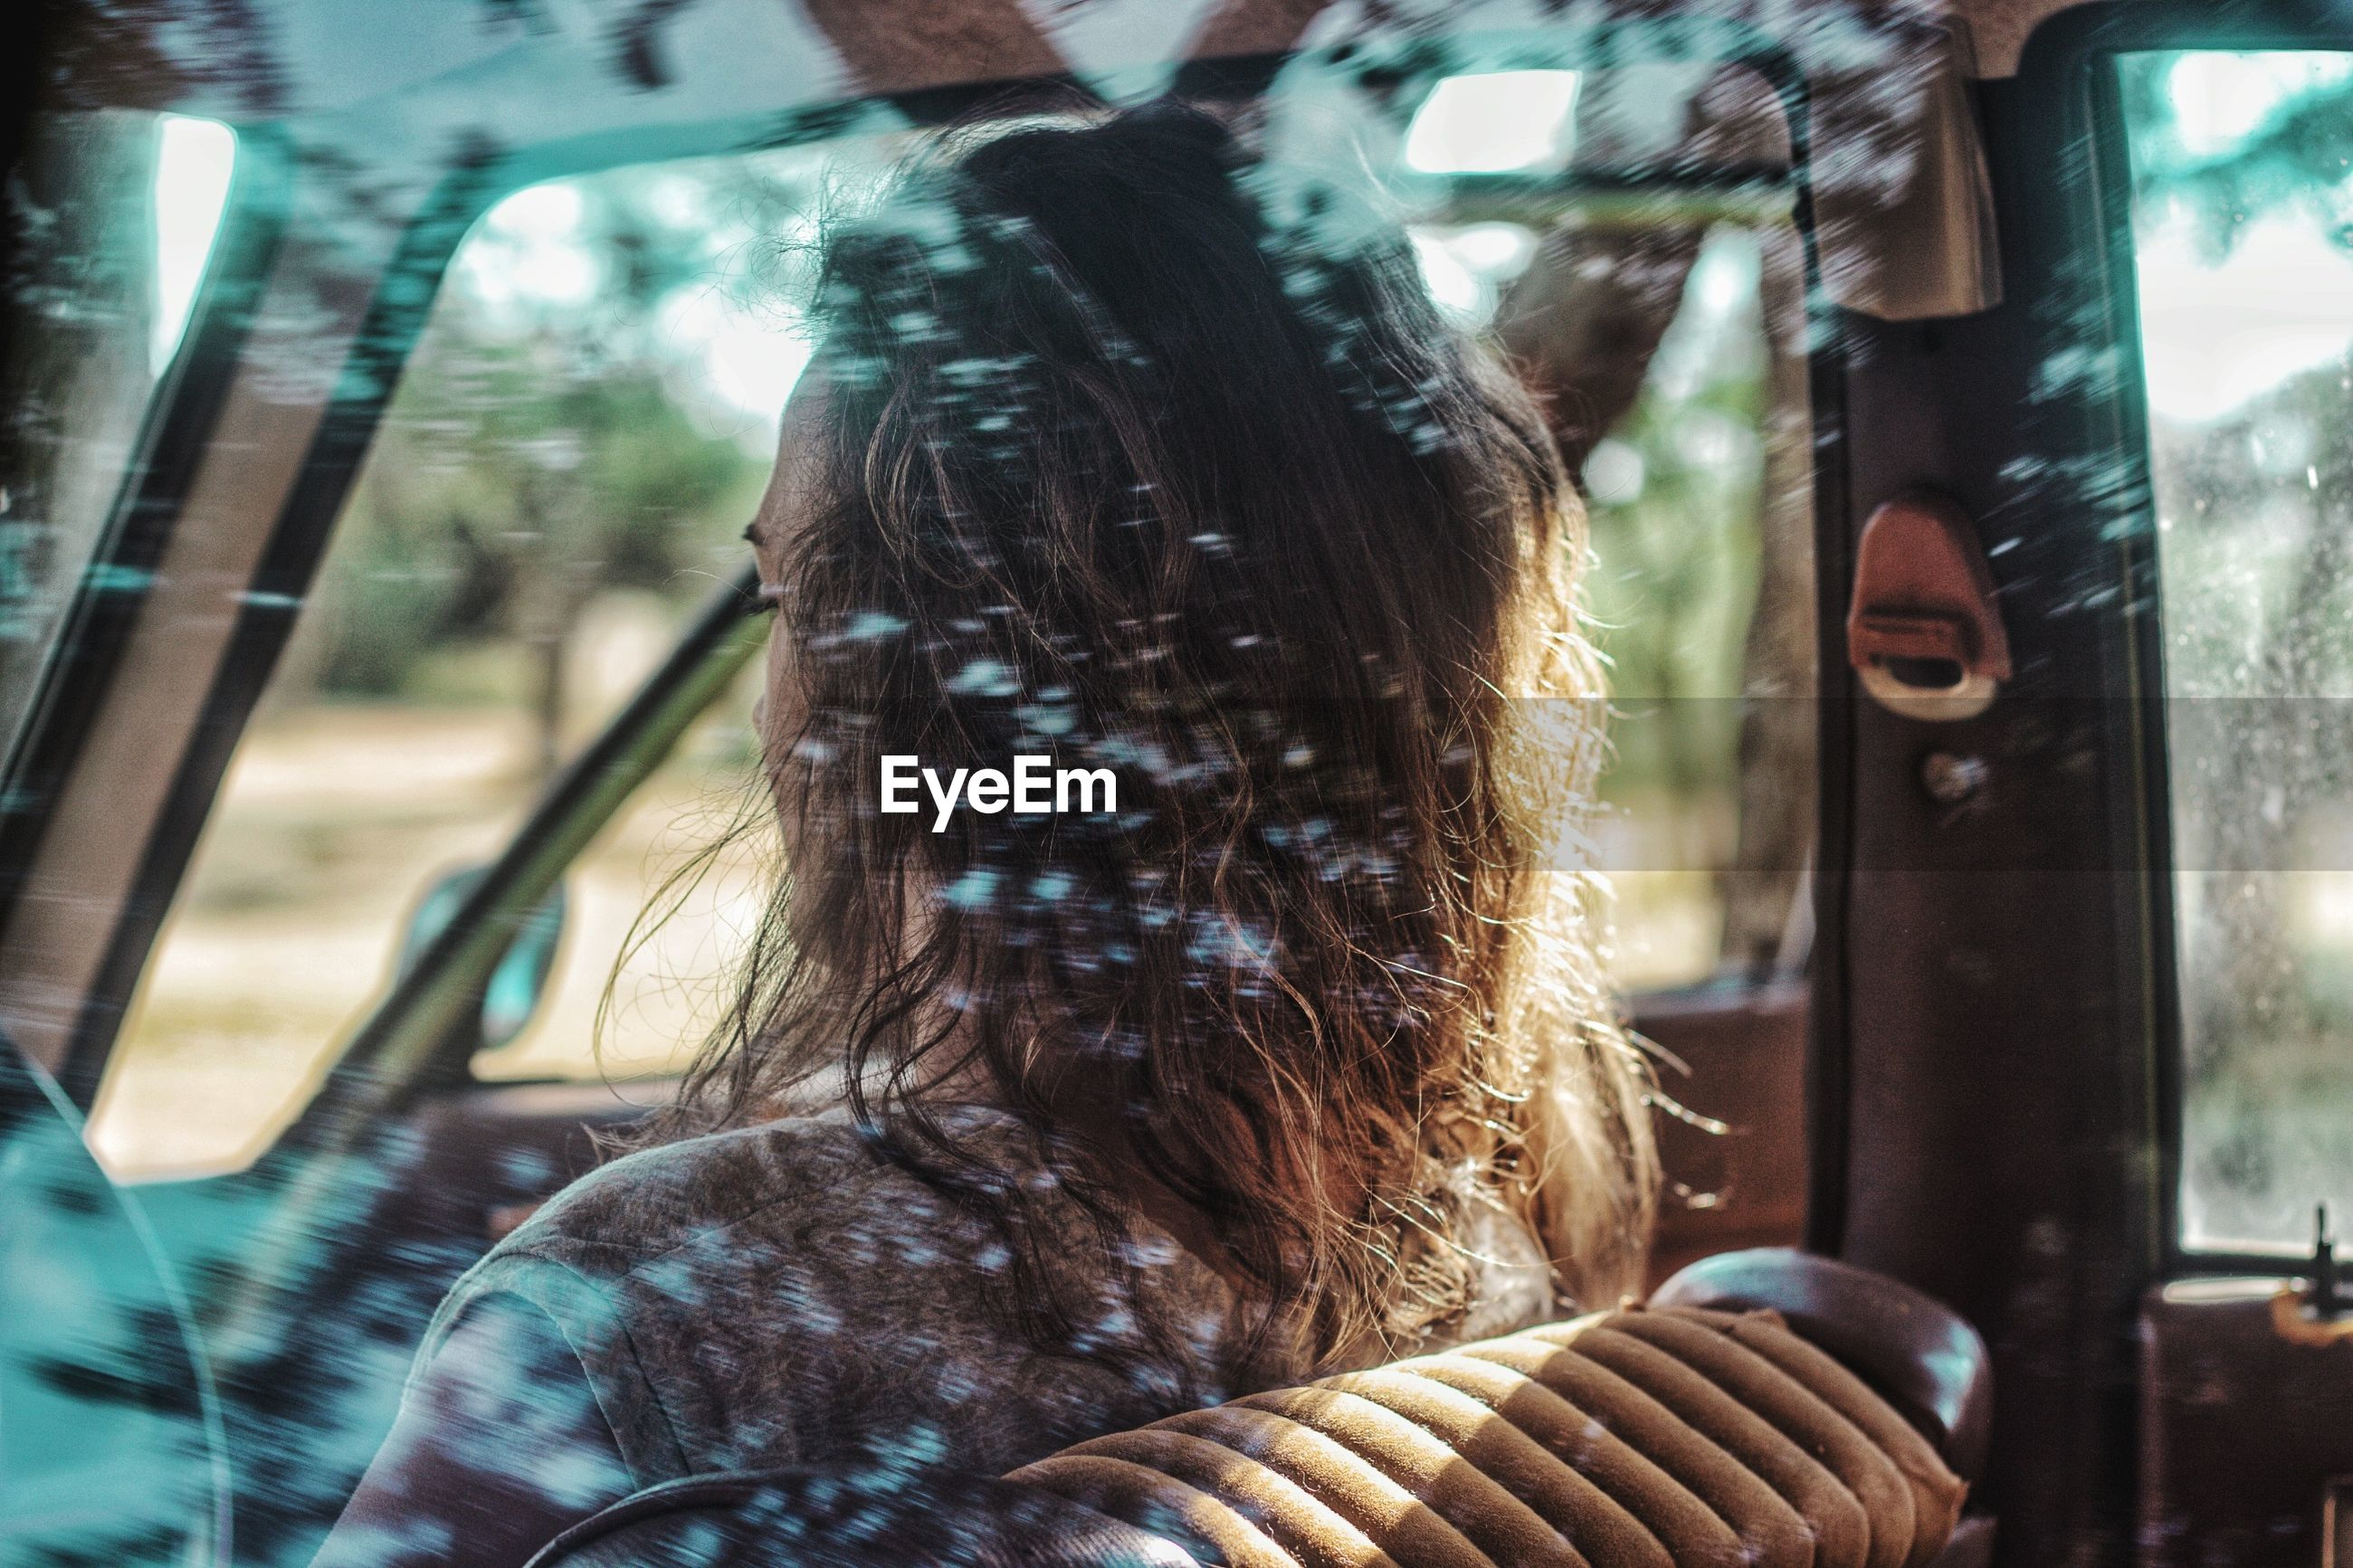 Woman sitting in car seen through window